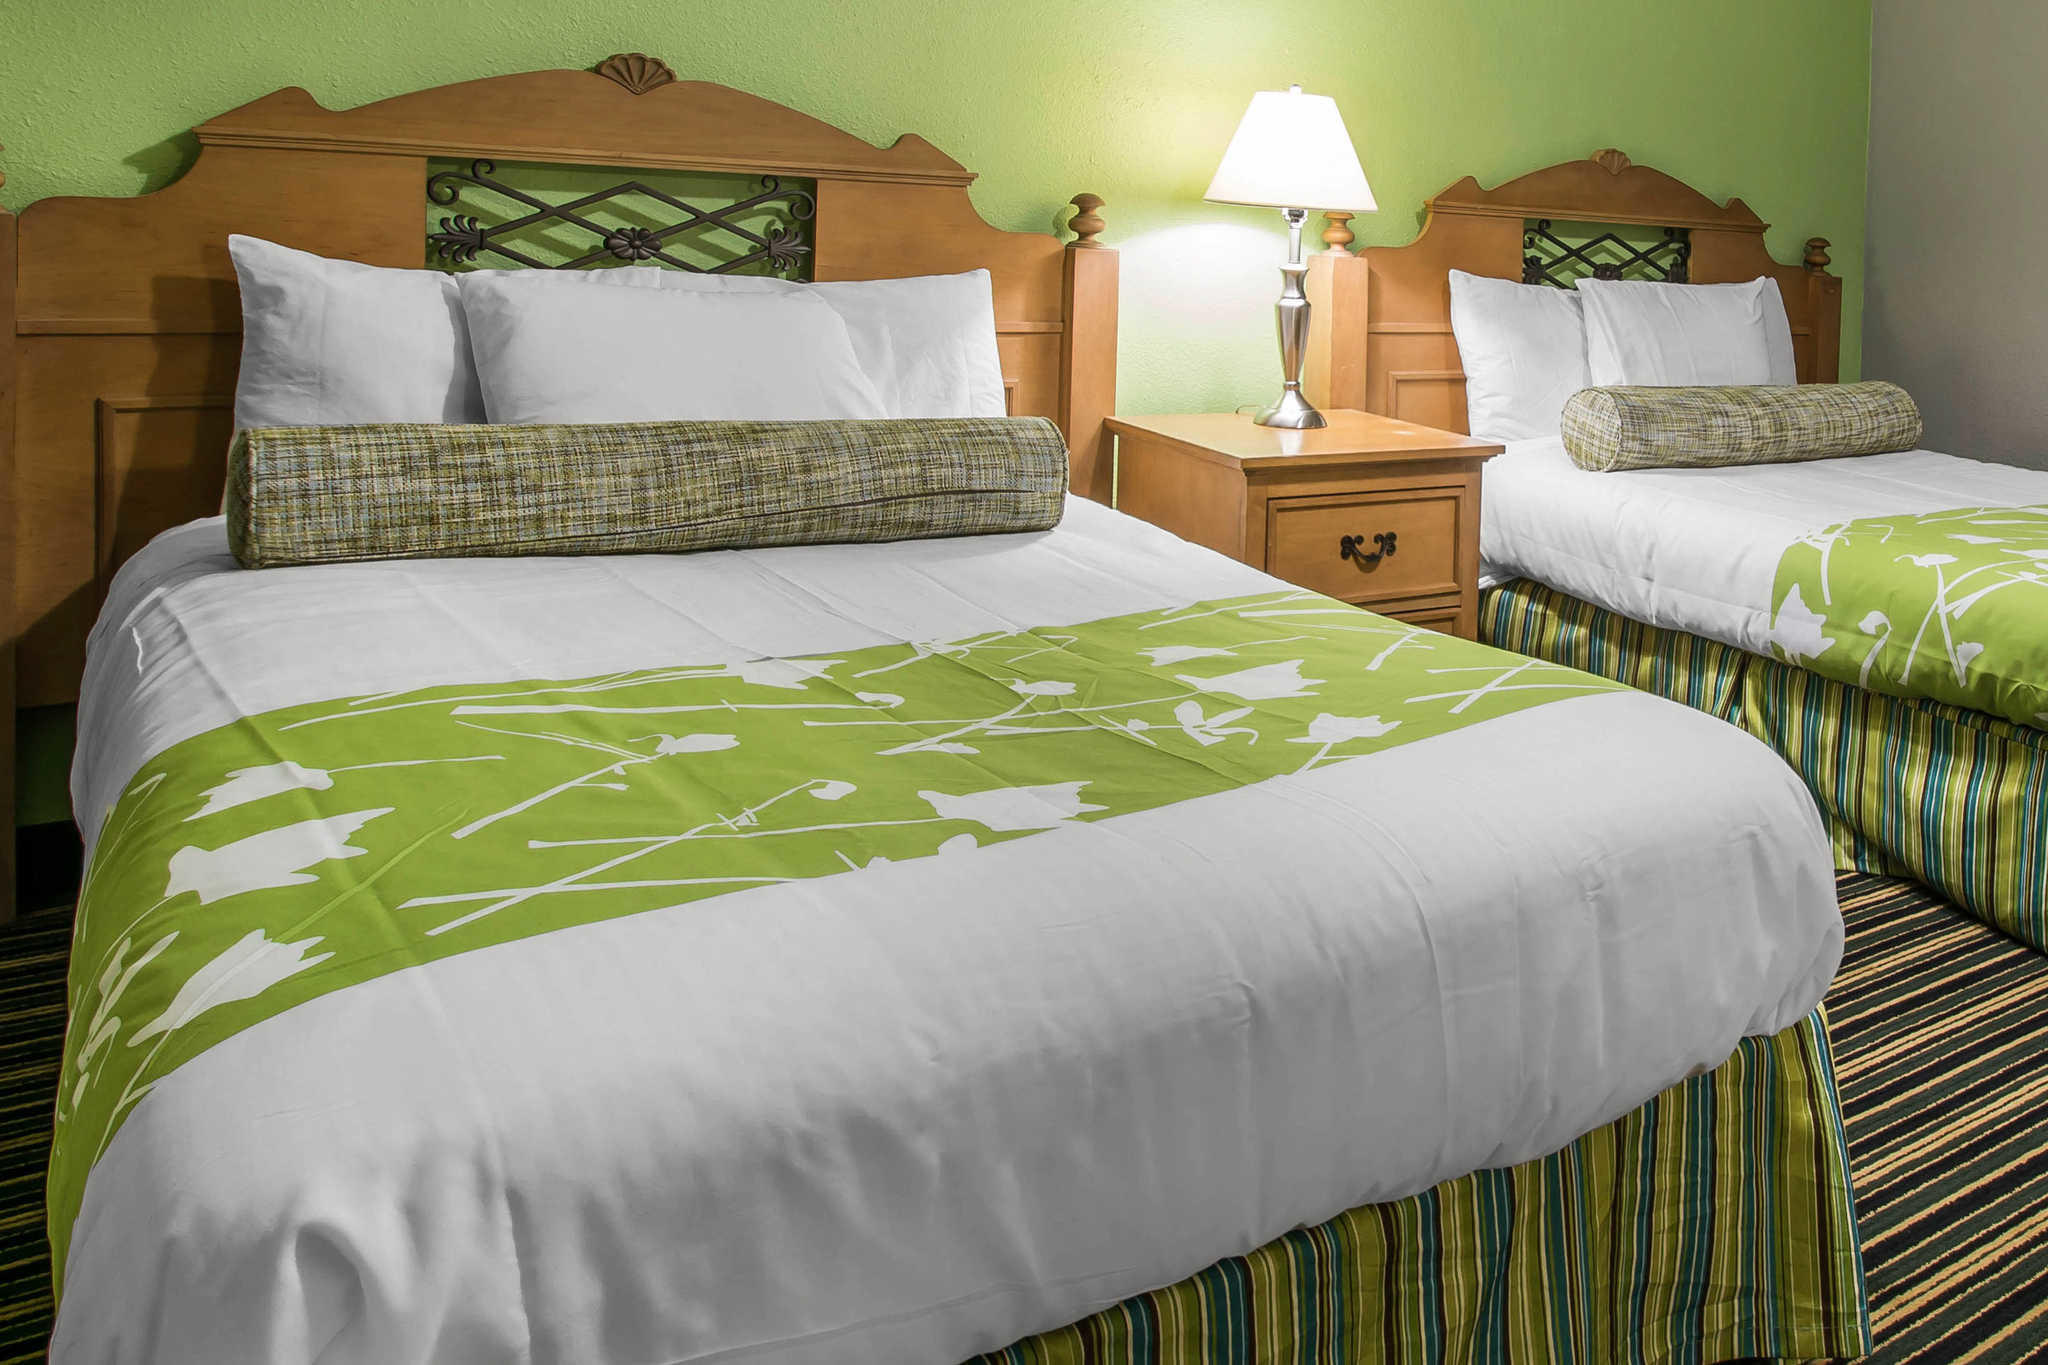 rodeway inn u0026 suites winter haven fl 33884 yp com